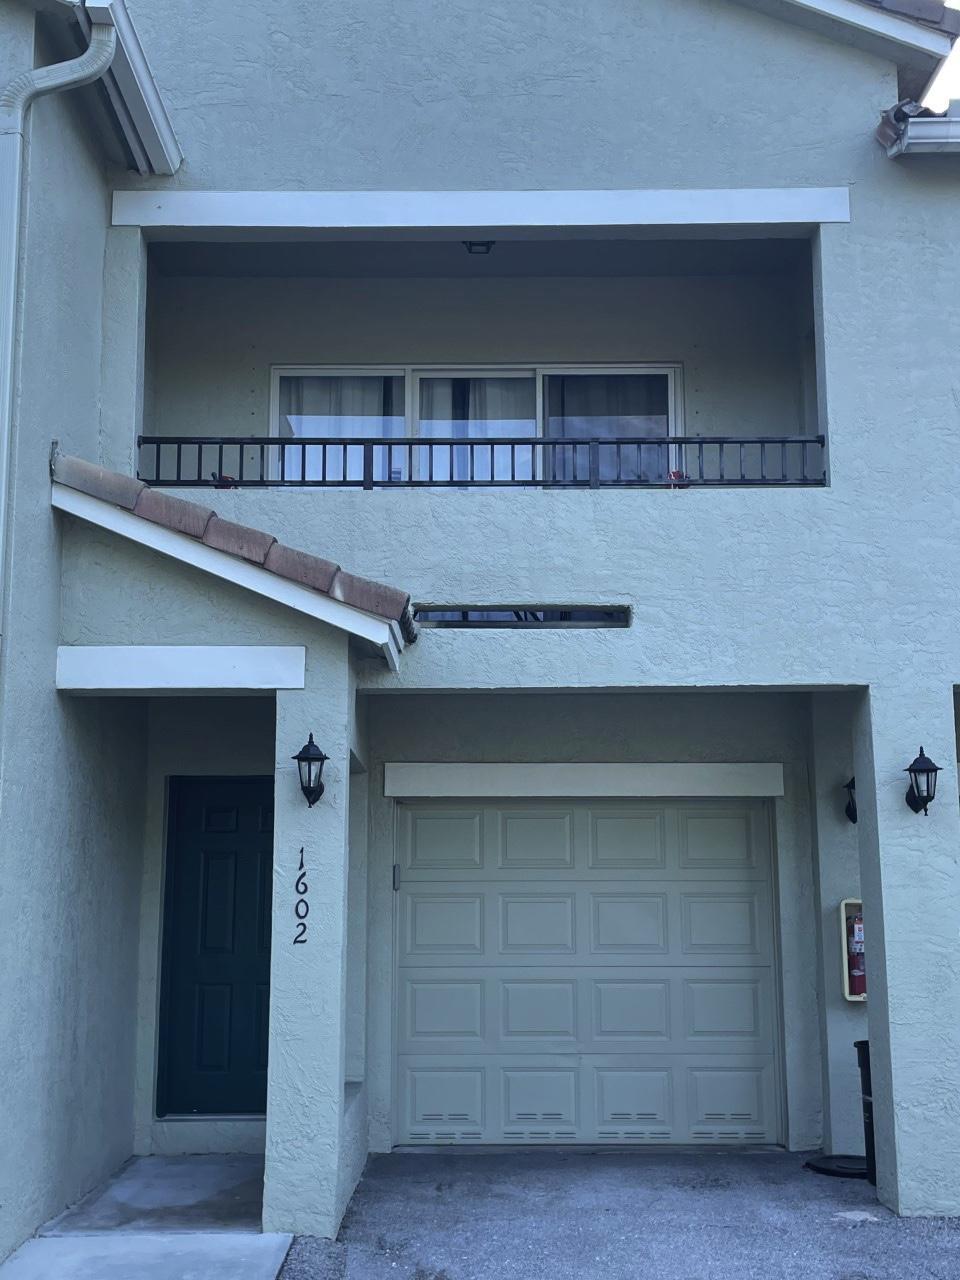 Listing Details for 1602 Belmont Place 1, Boynton Beach, FL 33436